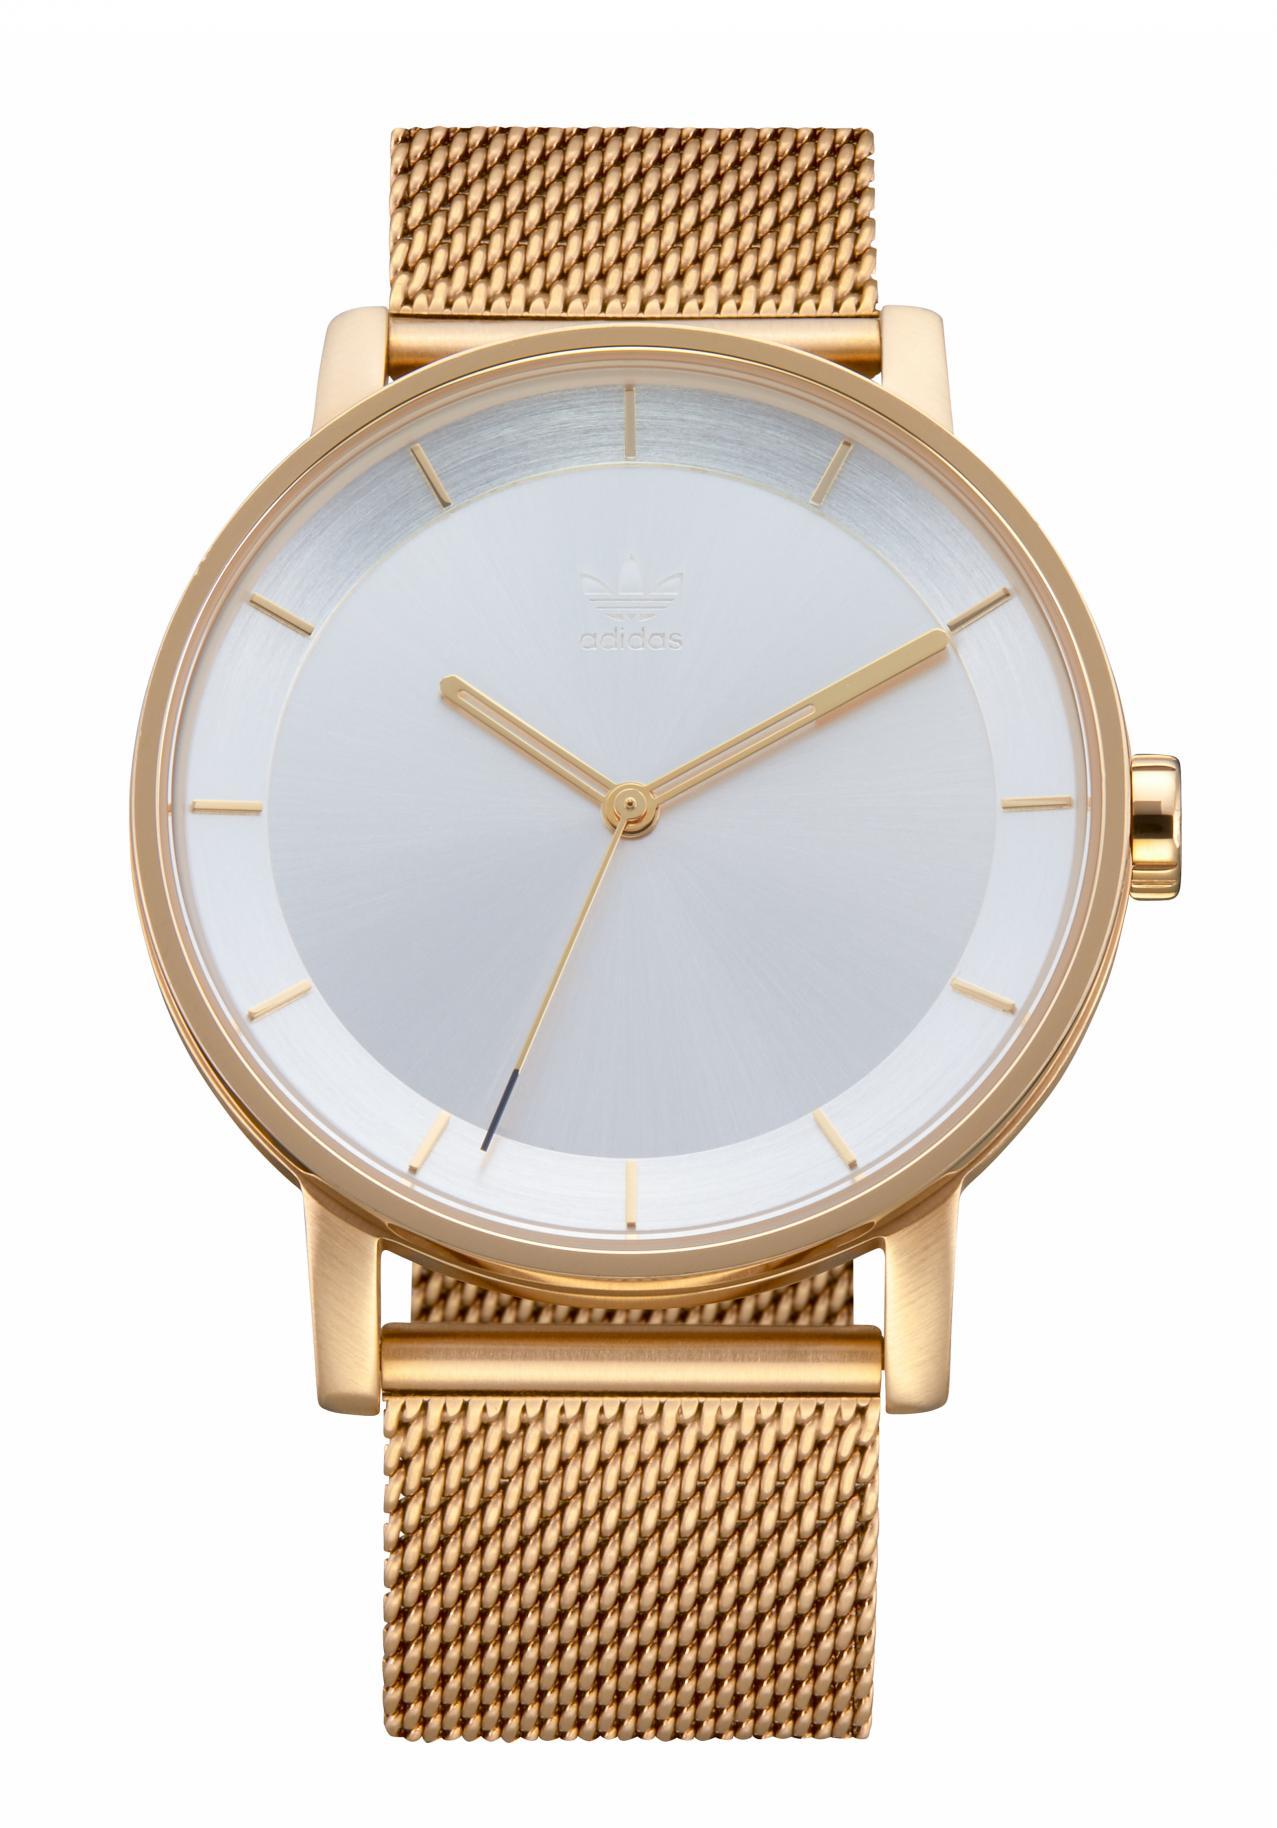 Adidas District Gold / Silver Sunray Armbanduhr